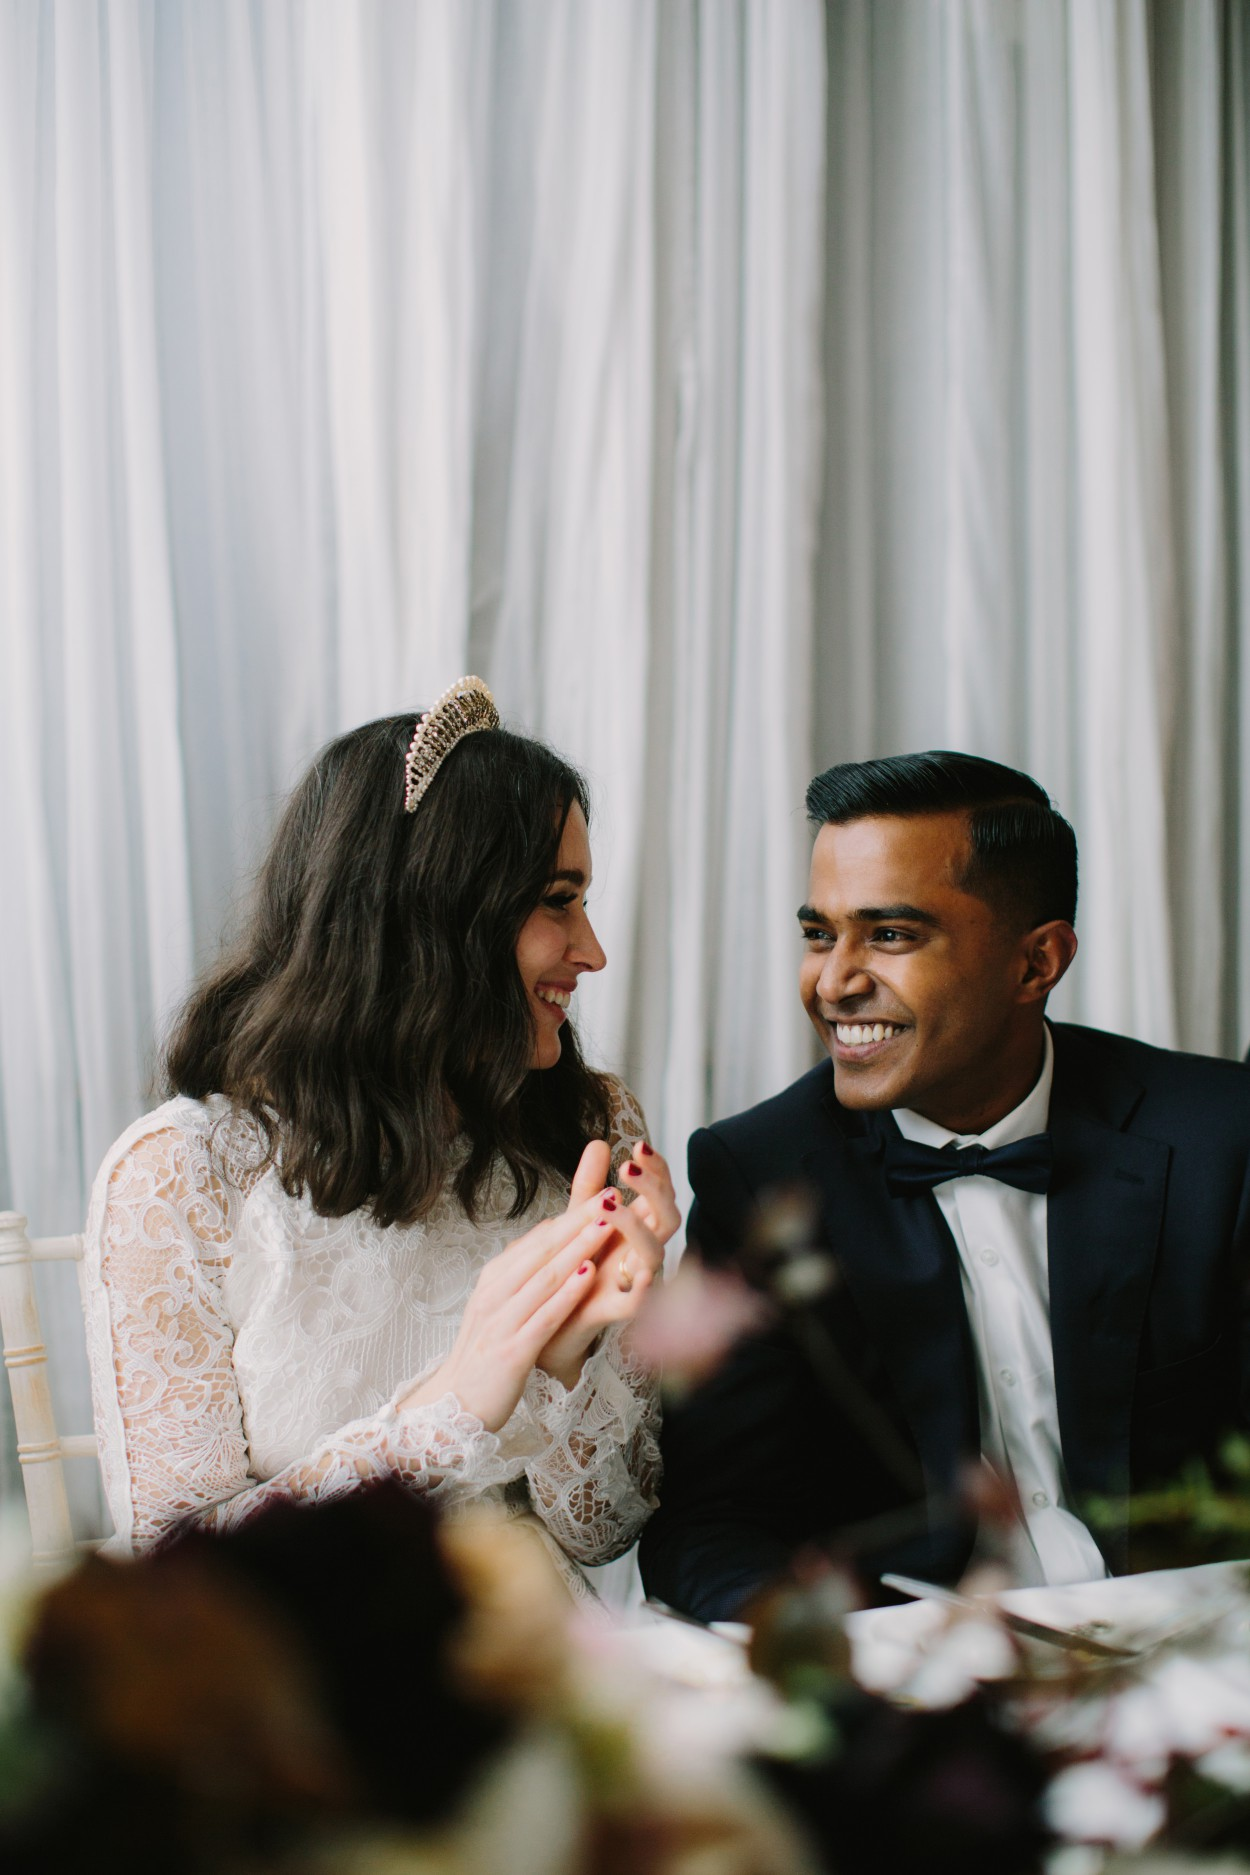 I-Got-You-Babe-Weddings-The-118George-Ballroom-St-Kilda-Wedding-Amy-Abhi.jpg